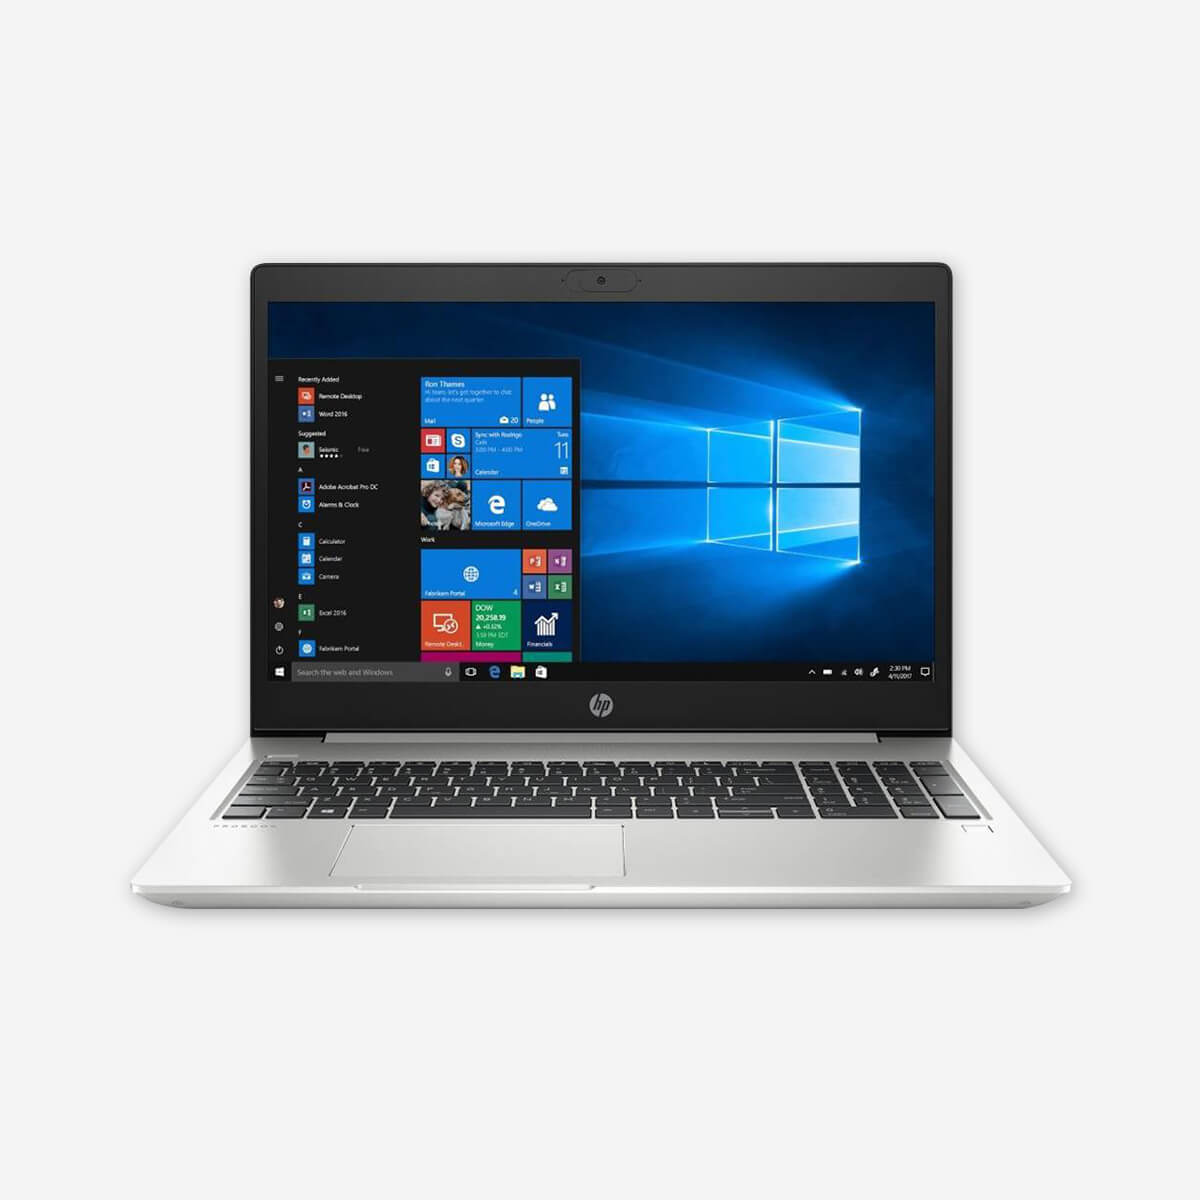 vendita laptop hp brescia